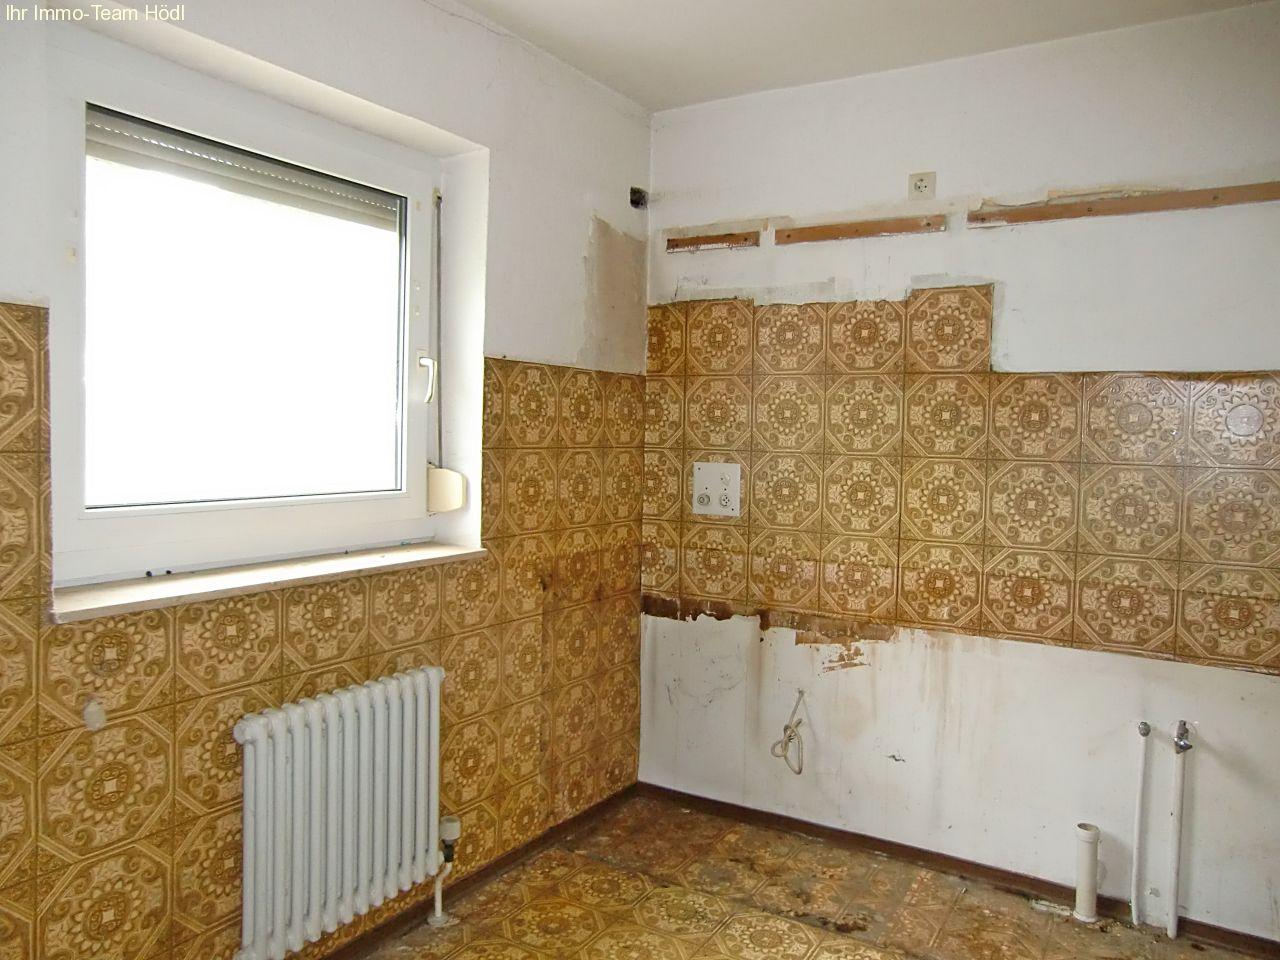 Immobilien - Reutlingen - Handwerker aufgepasst! Reihenhaus ...